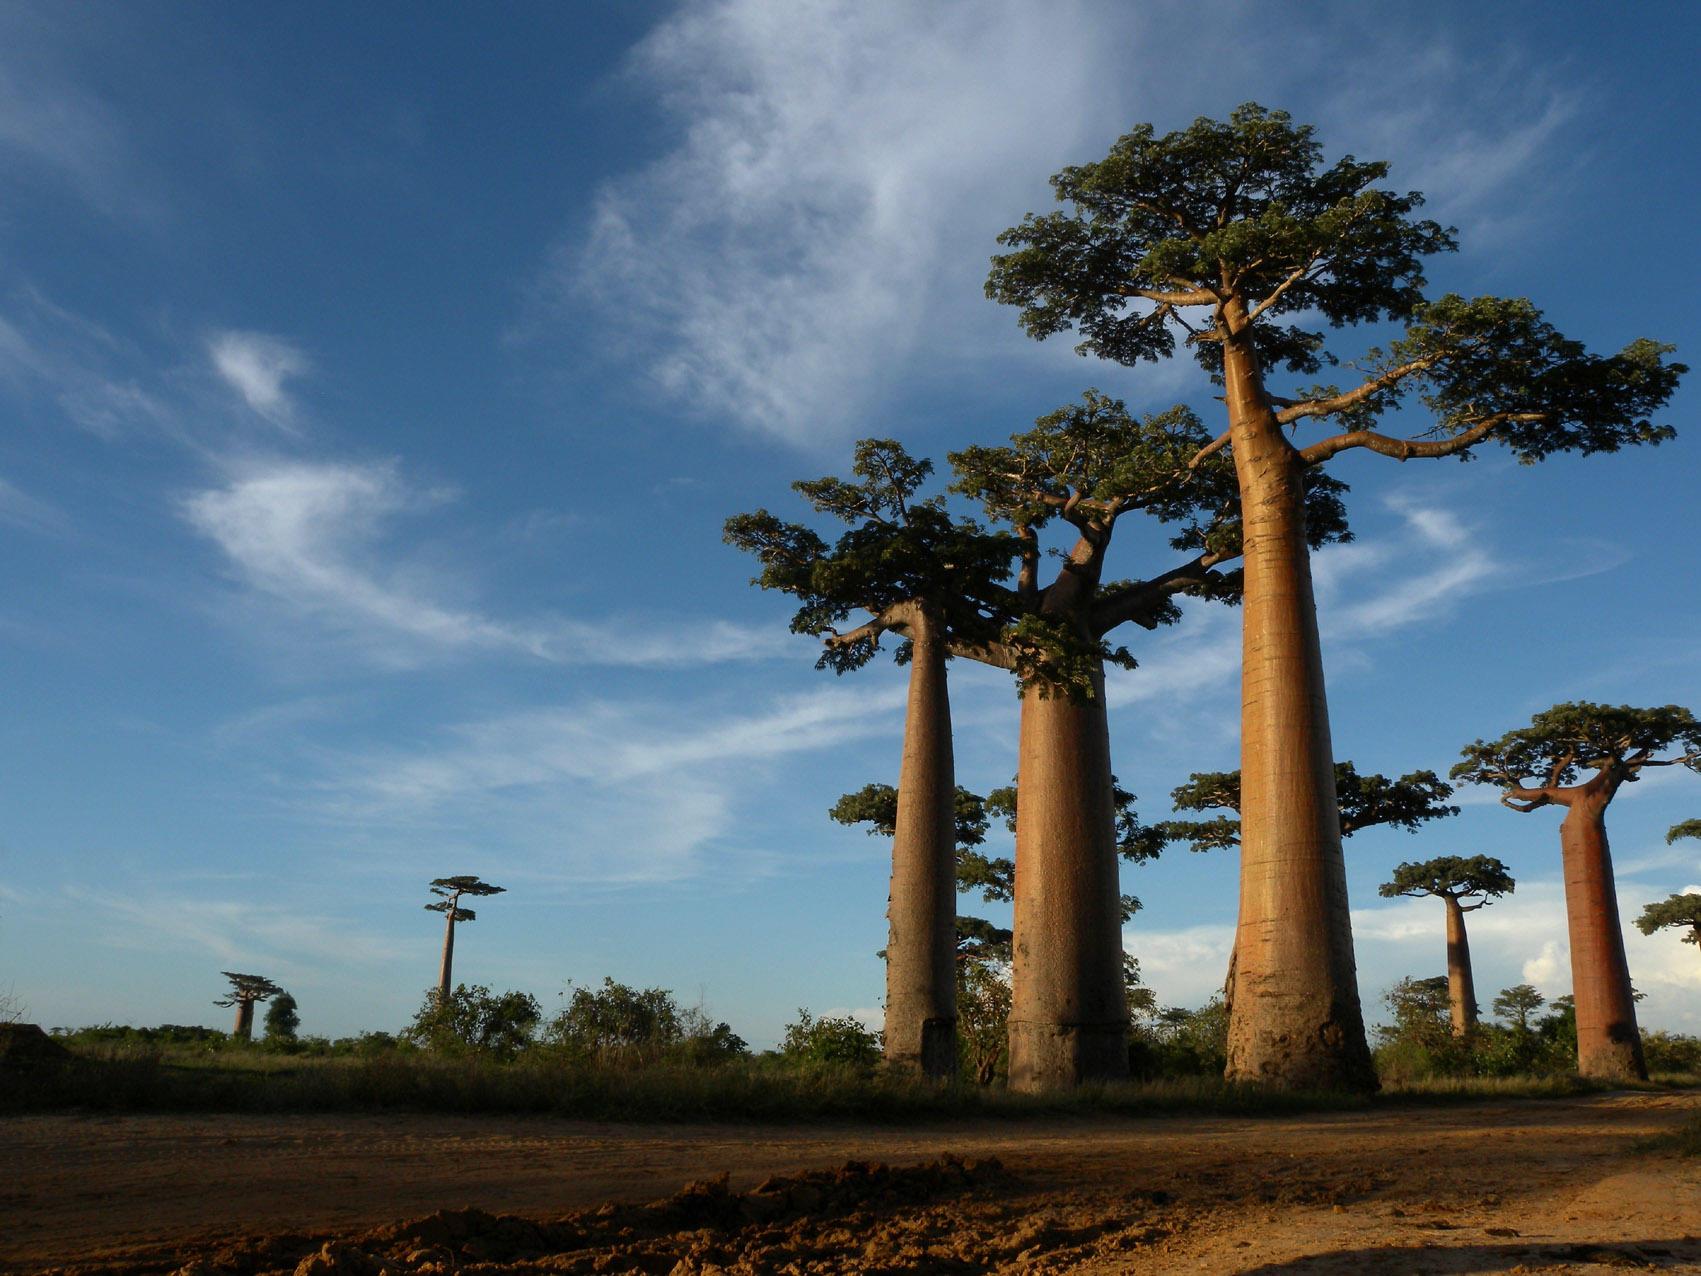 baobob trees Madagascar Rainforest Science Image Frank Vassen, Wikipedia